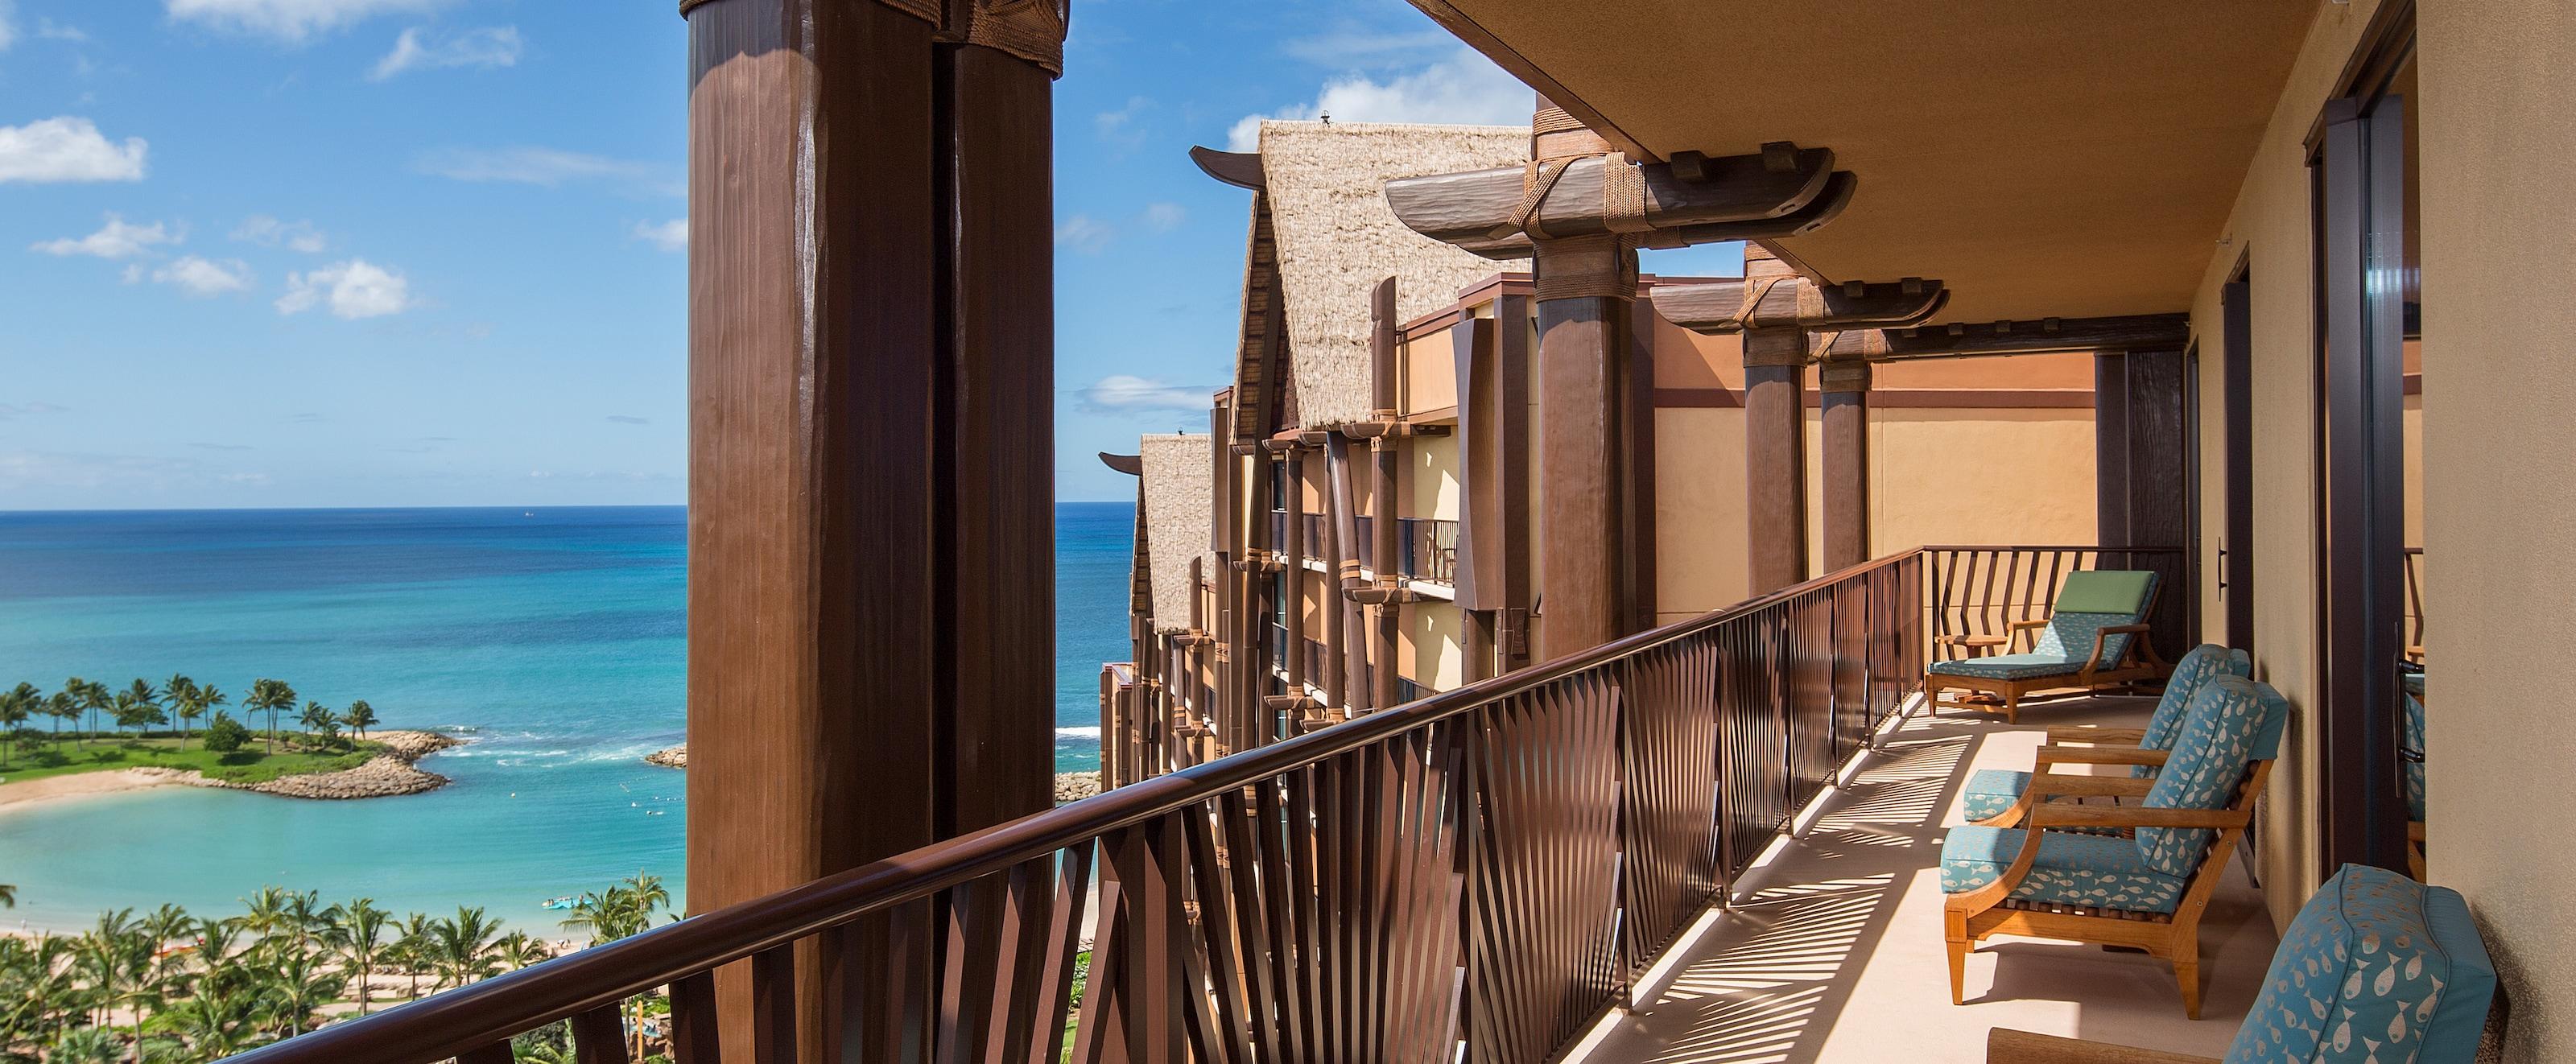 One Bedroom Deluxe Suite | Aulani Hawaii Resort & Spa